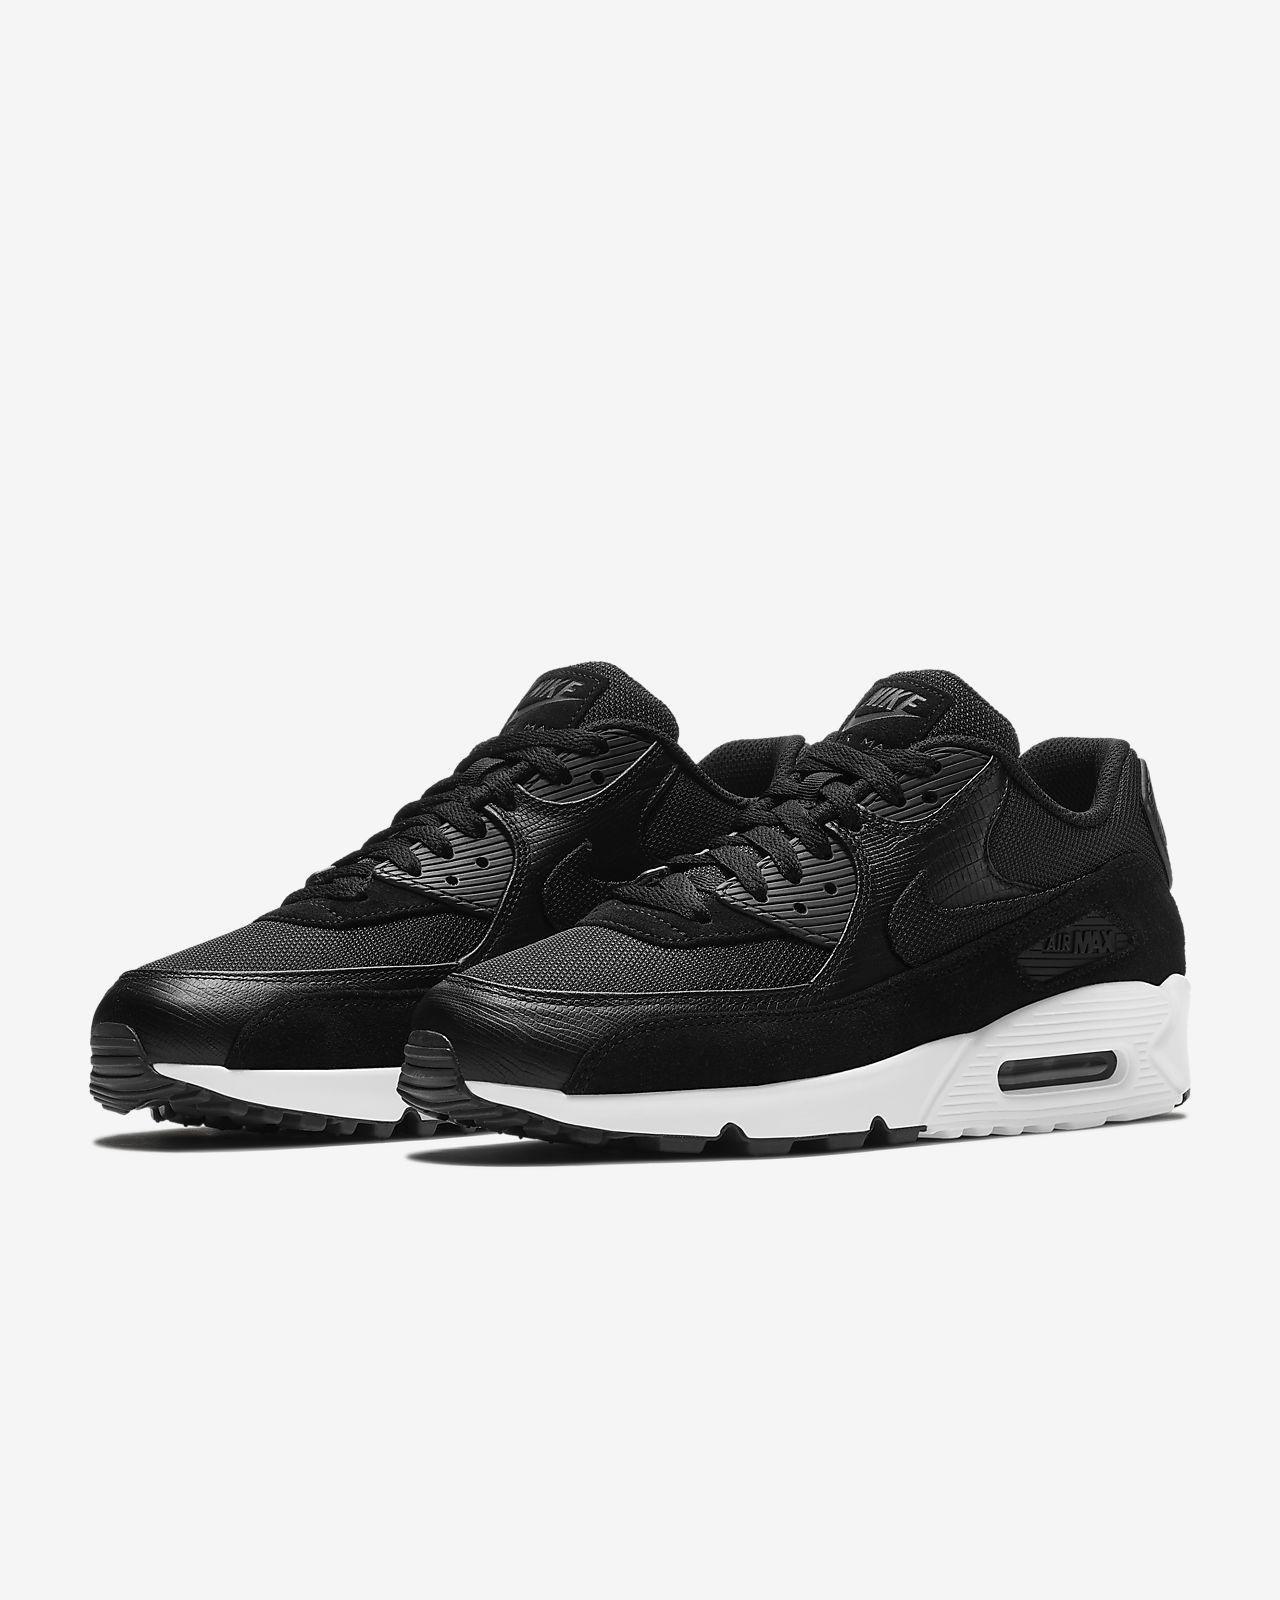 Nike Air Max 90 Premium / i2Zvm